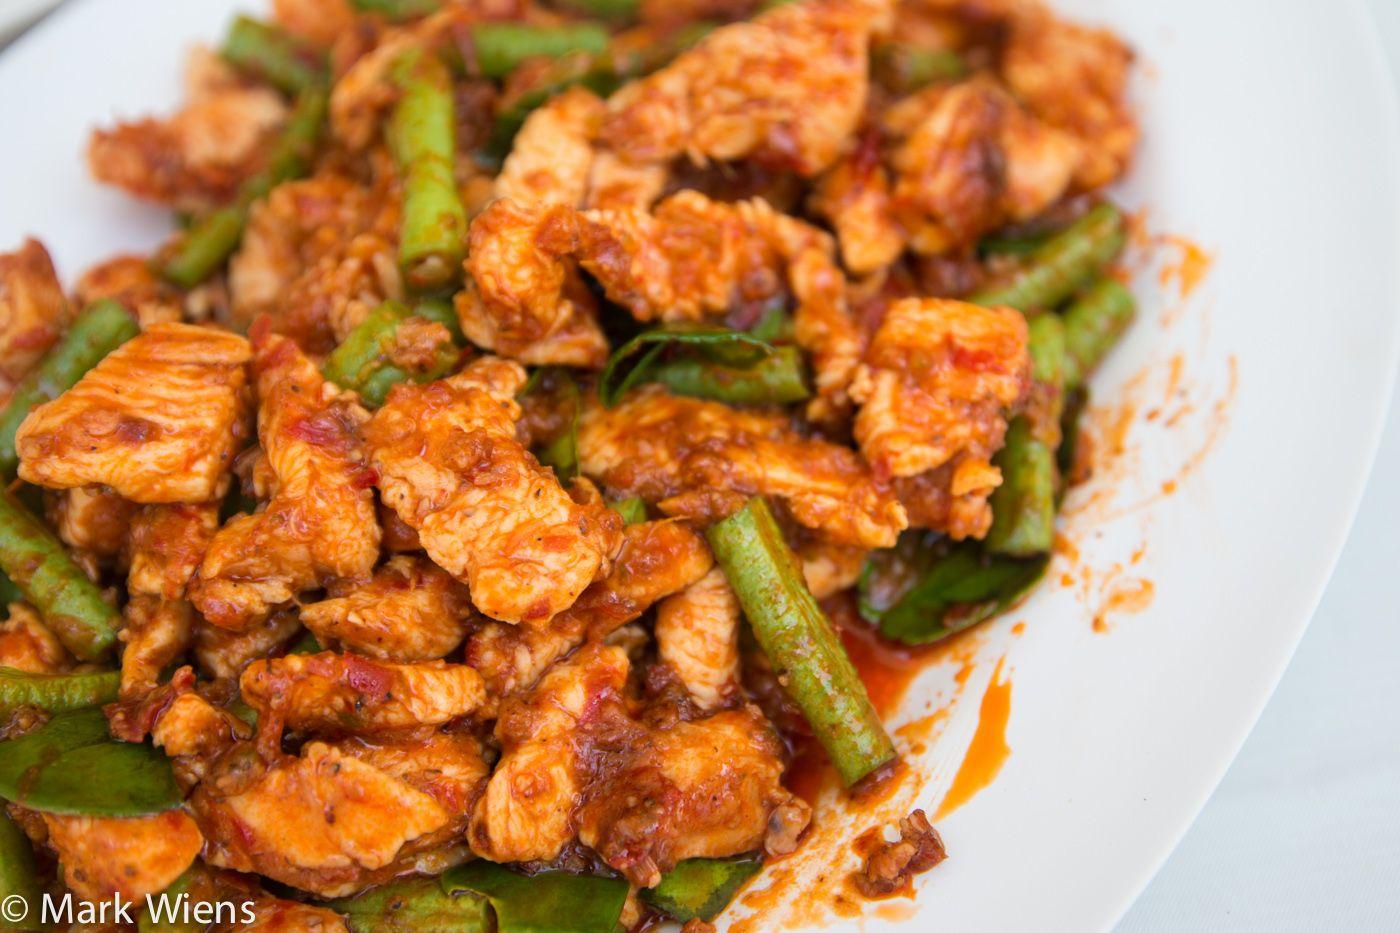 Gai pad prik gaeng recipe ไกผดพรกแกง recipe food